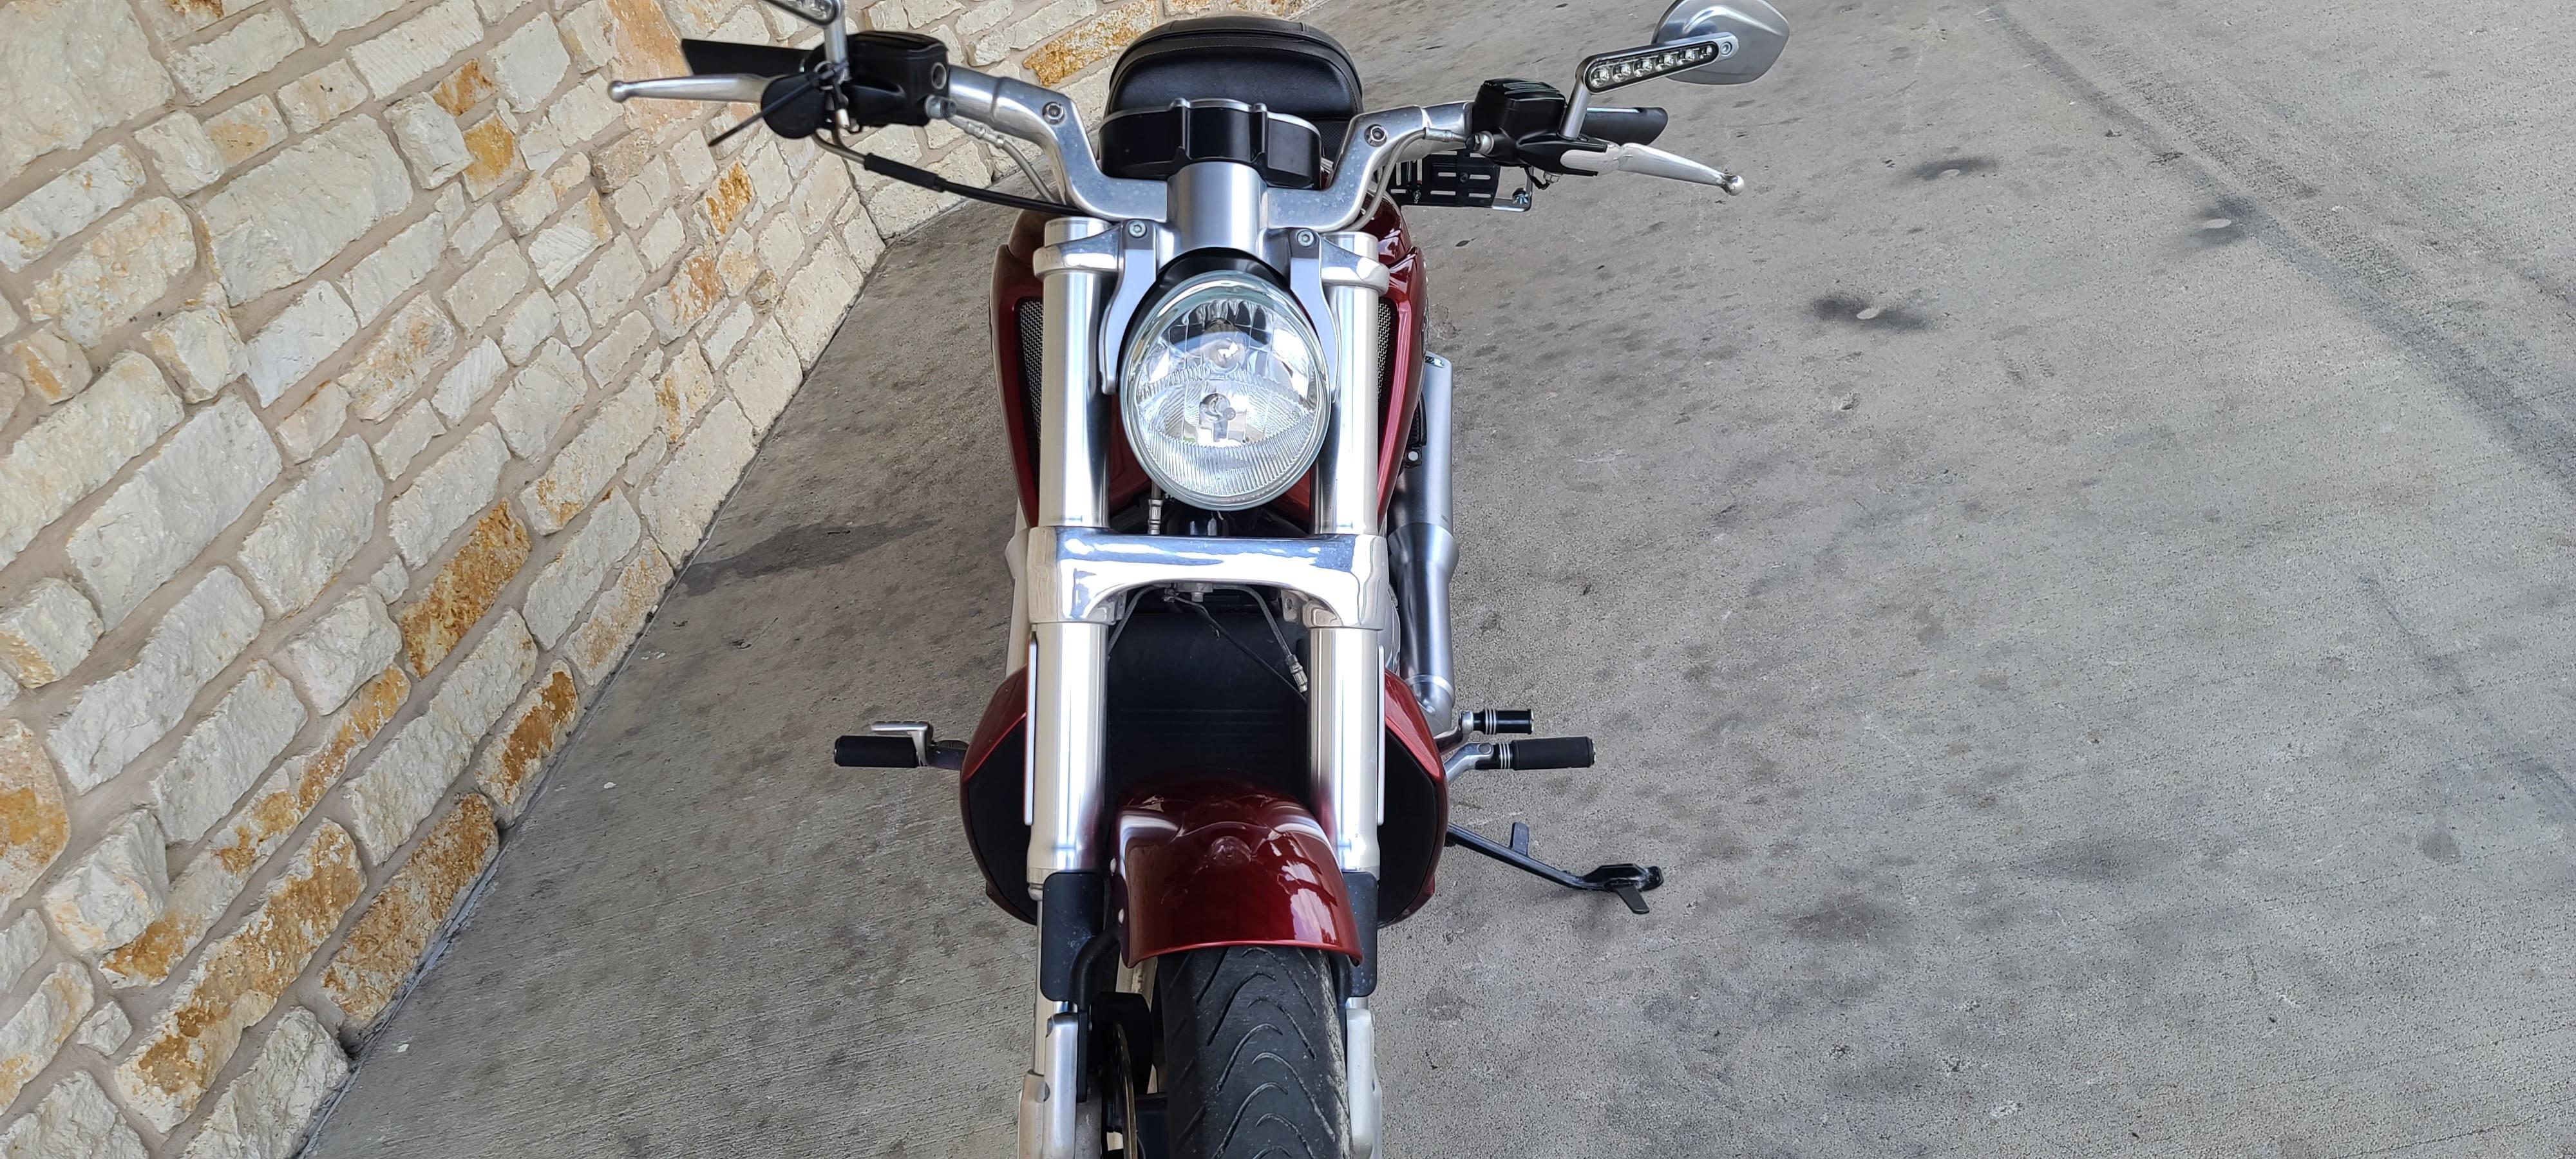 2009 Harley-Davidson VRSC V-Rod Muscle at Harley-Davidson of Waco